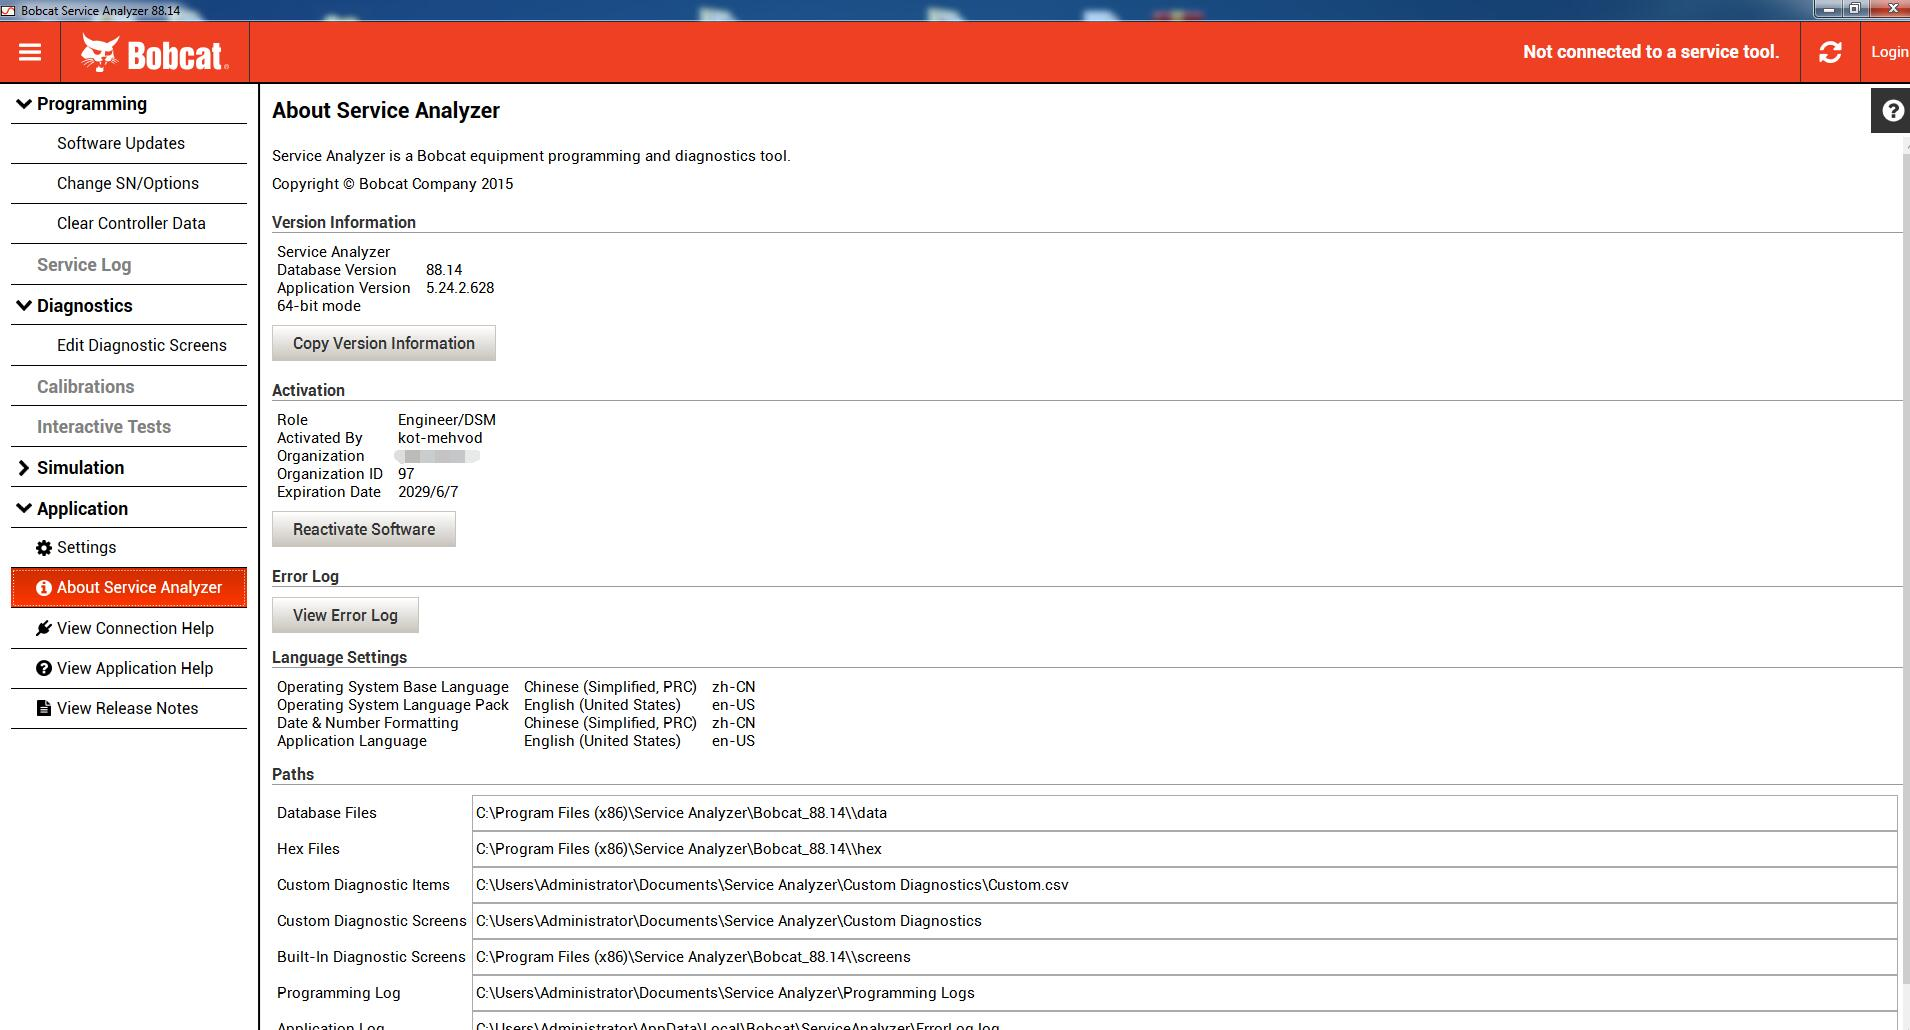 2020 Bobcat Service Analyzer 88.14 Download & Installation Guide